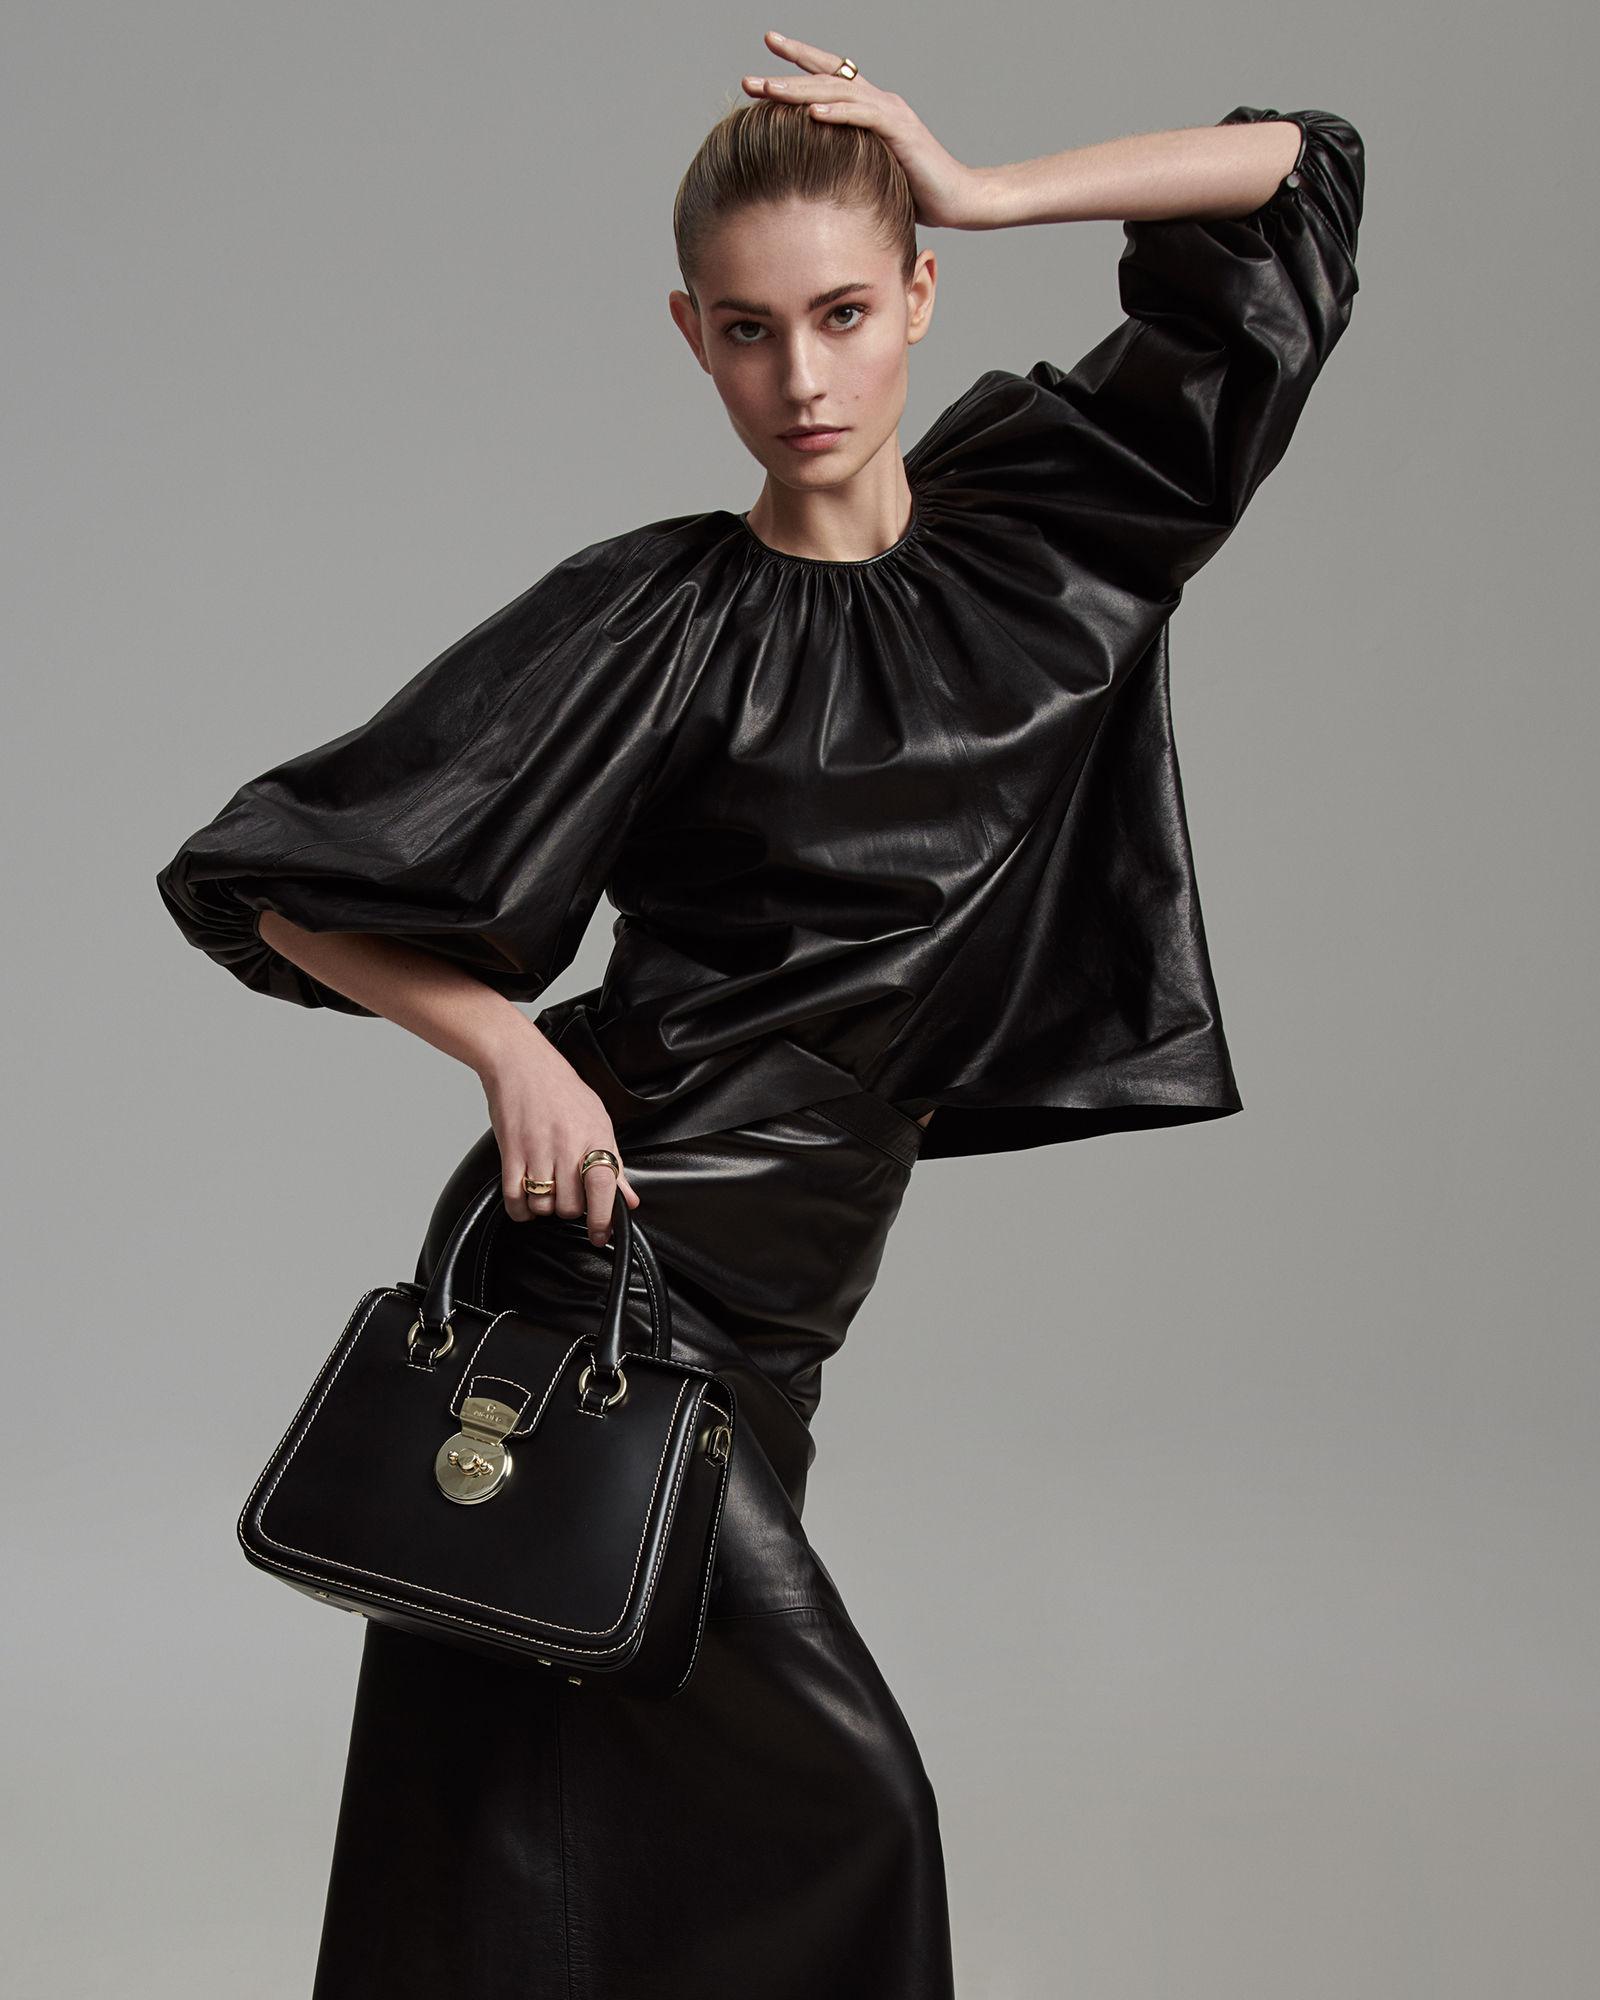 ANDREAS ORTNER : Top Model Nadja Bender for ELLE Germany